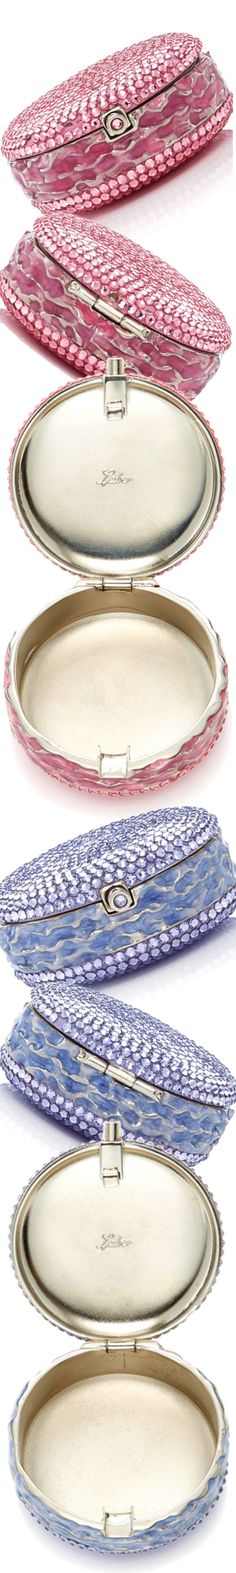 Judith Leiber Couture Macaron Pillbox